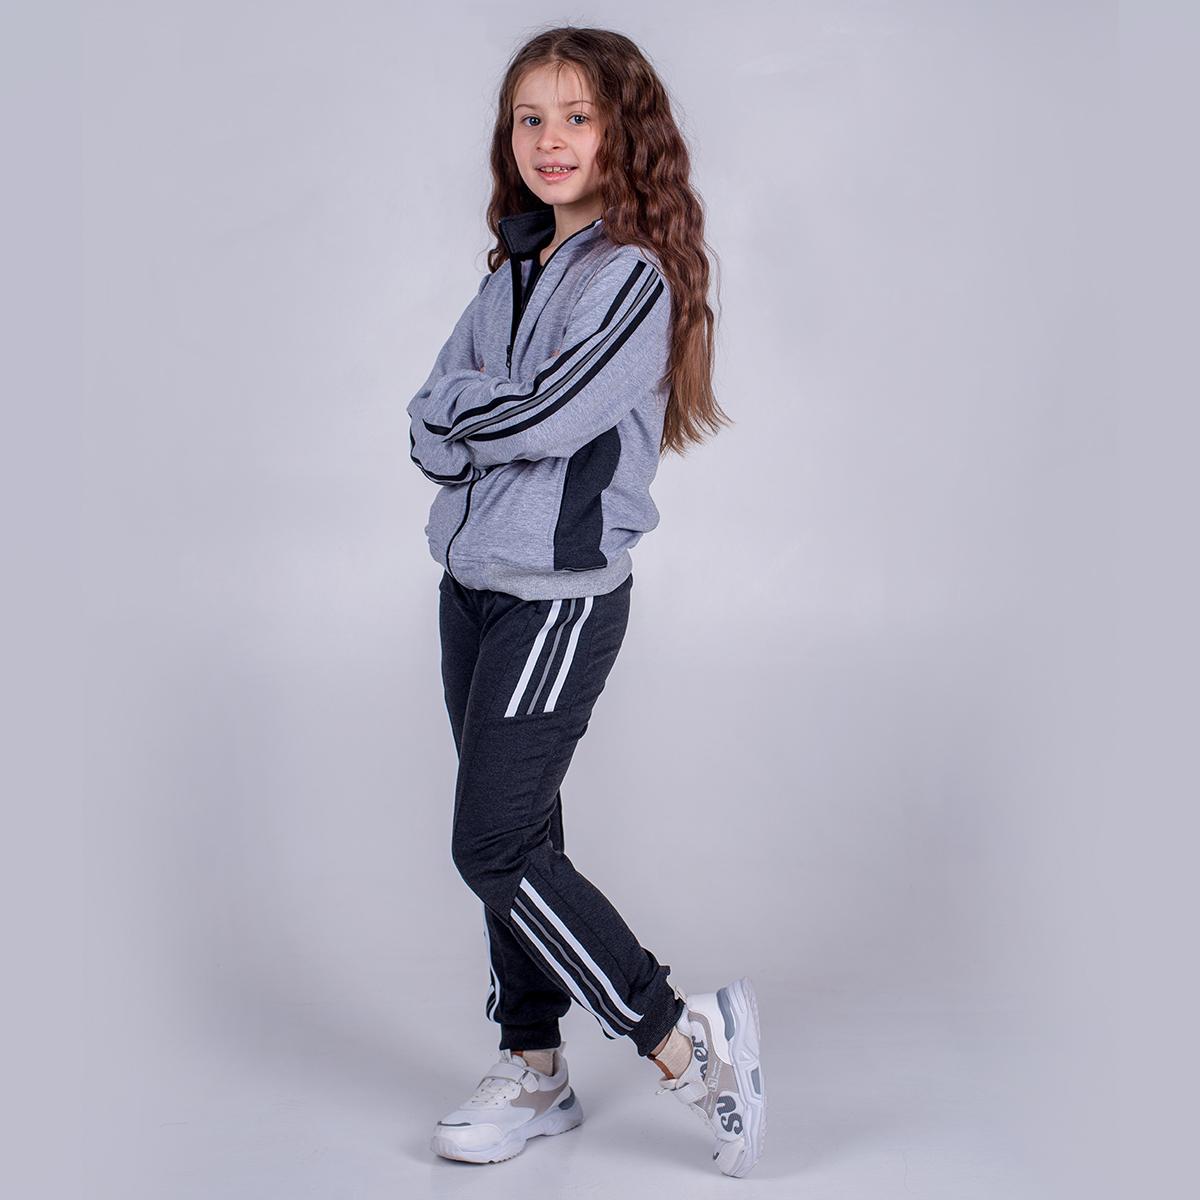 Костюм спортивный для девочки SmileTime Just Stripes, серый